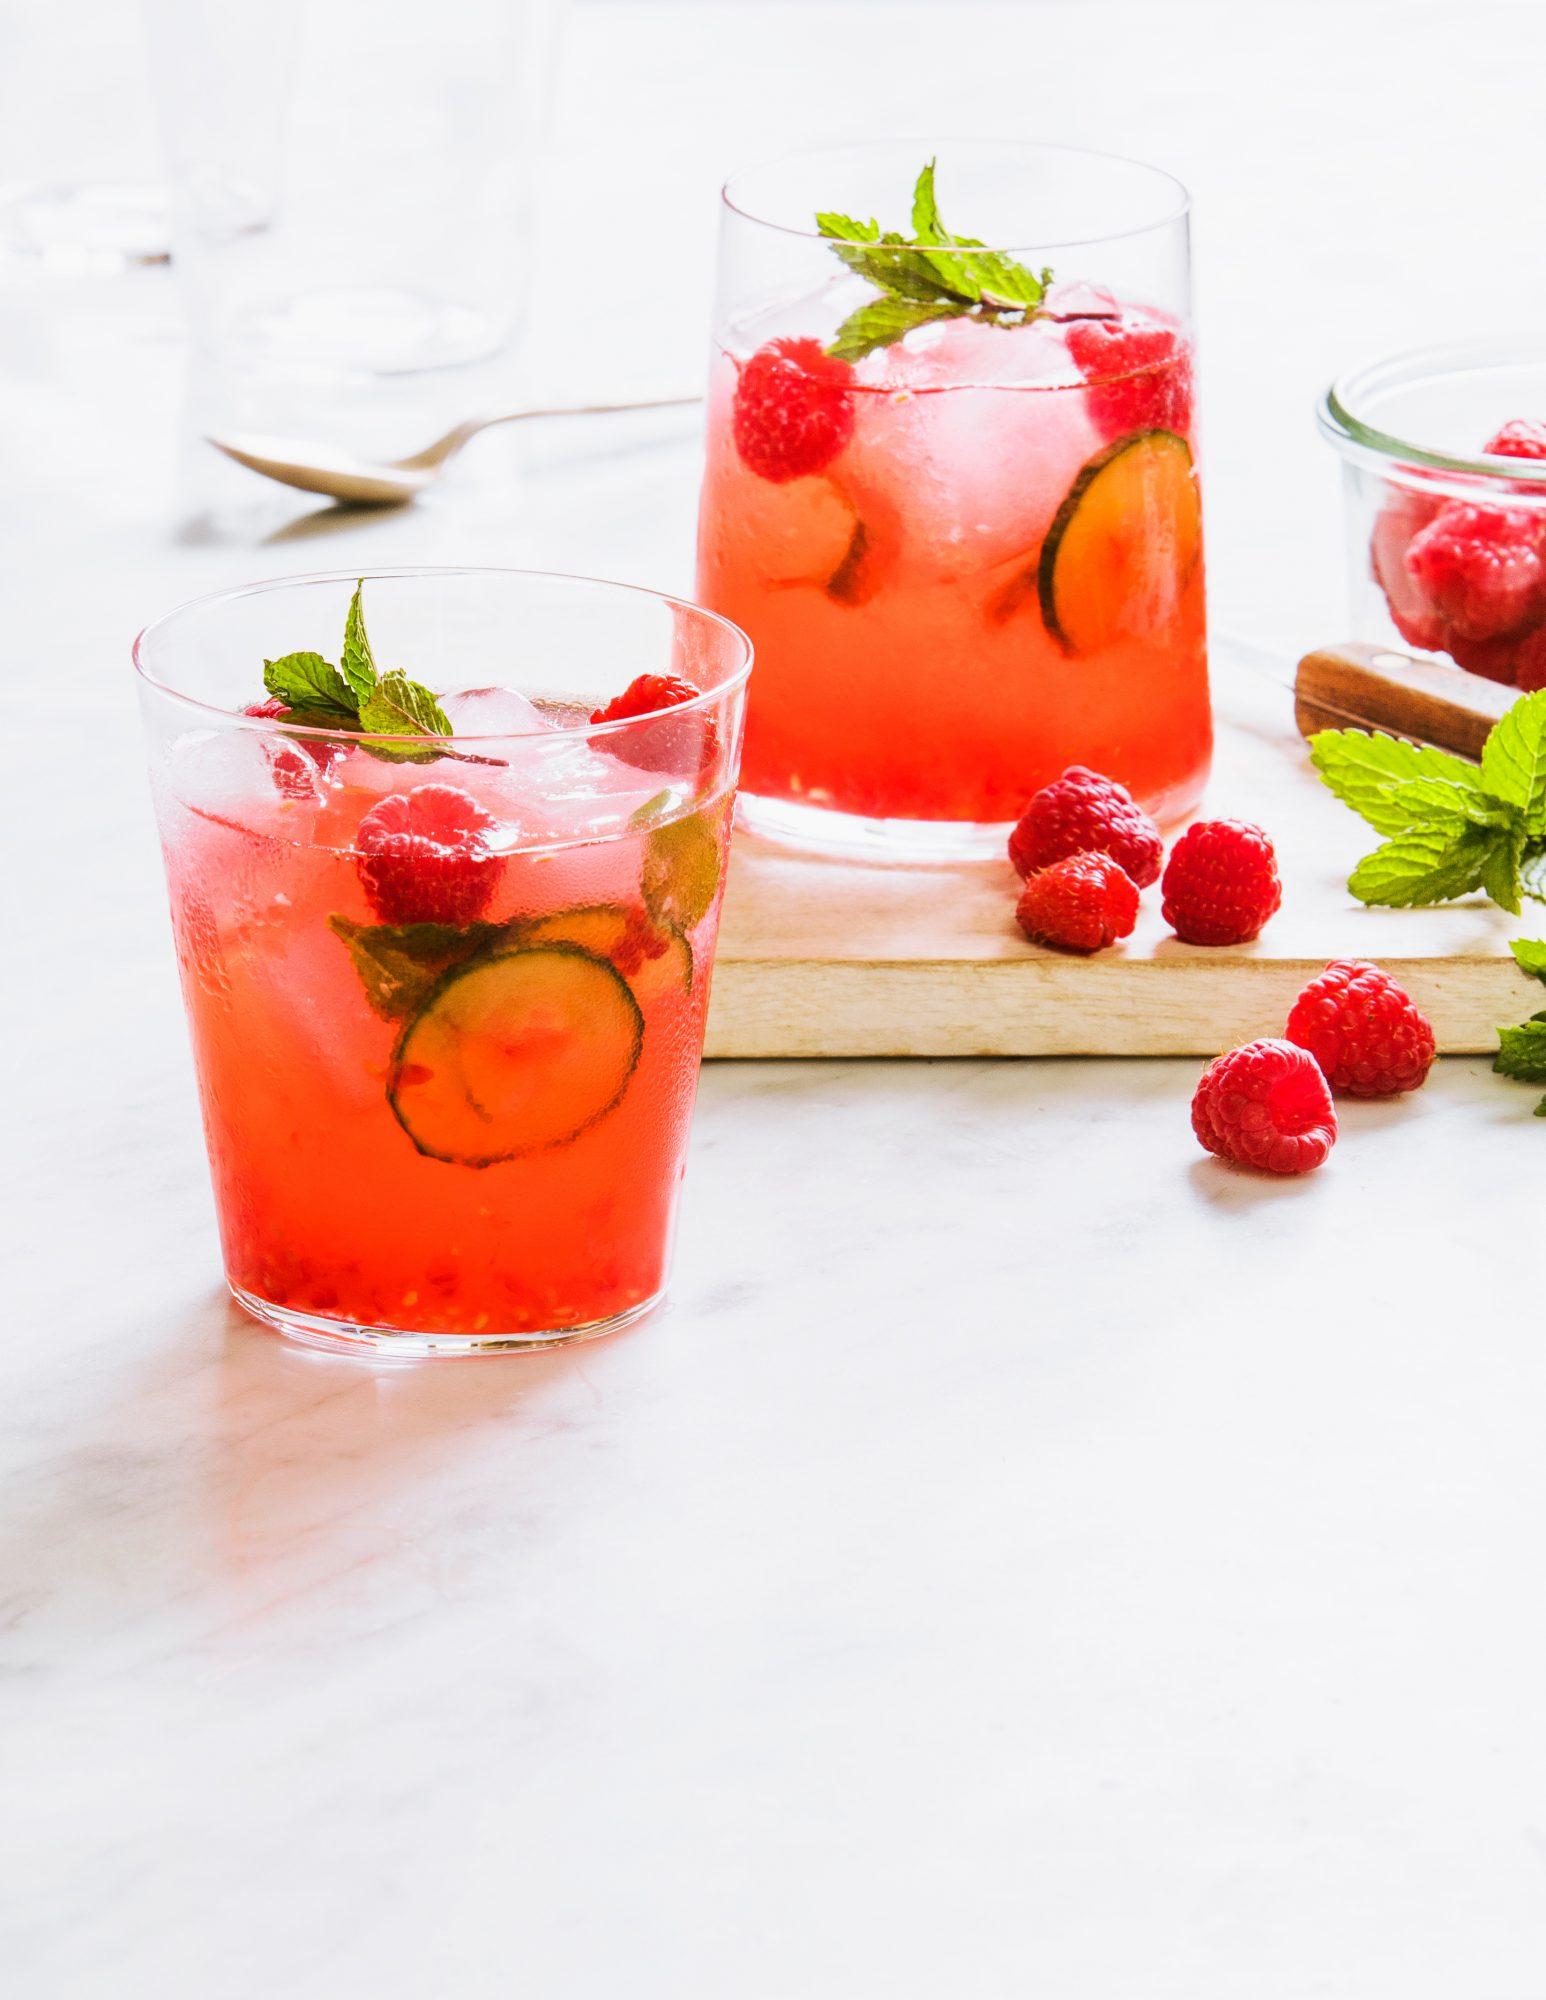 Raspberry, Cucumber, and Mint Smash